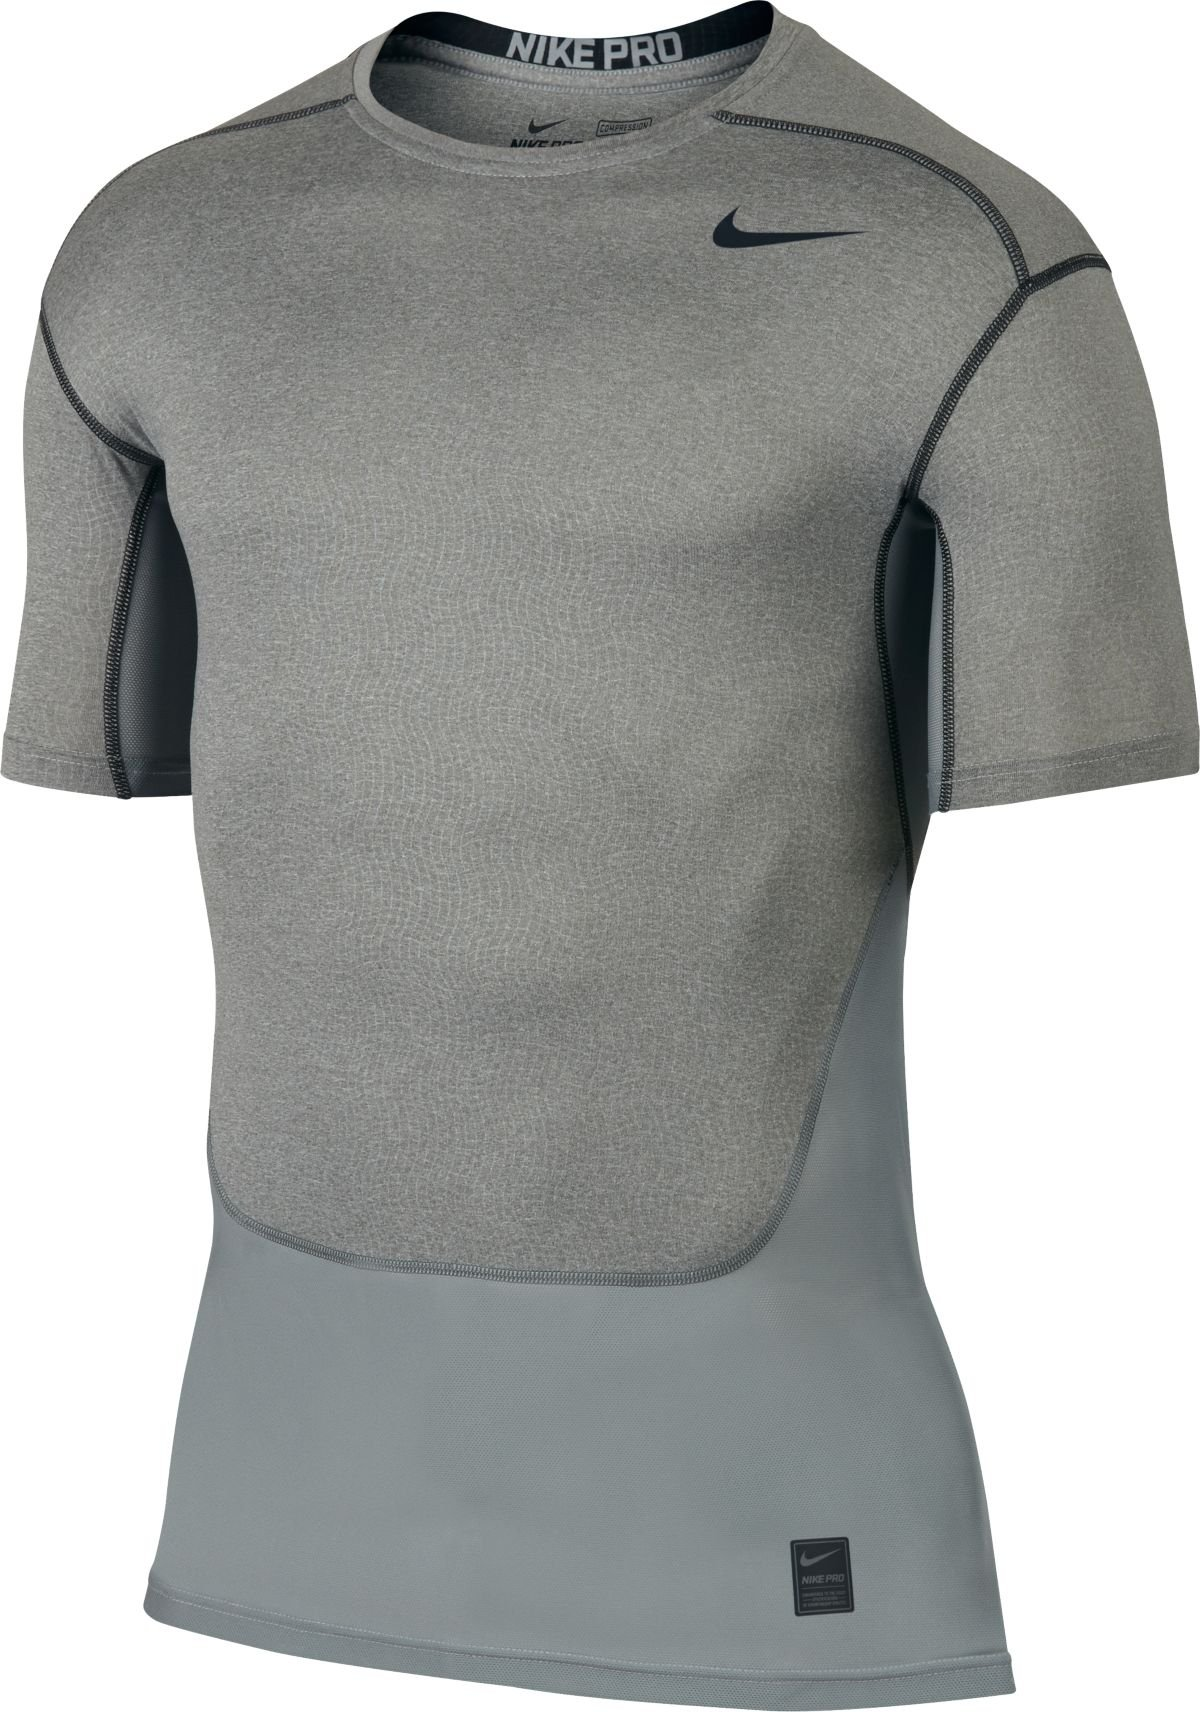 Kompresní triko Nike HYPERCOOL COMP SS TOP